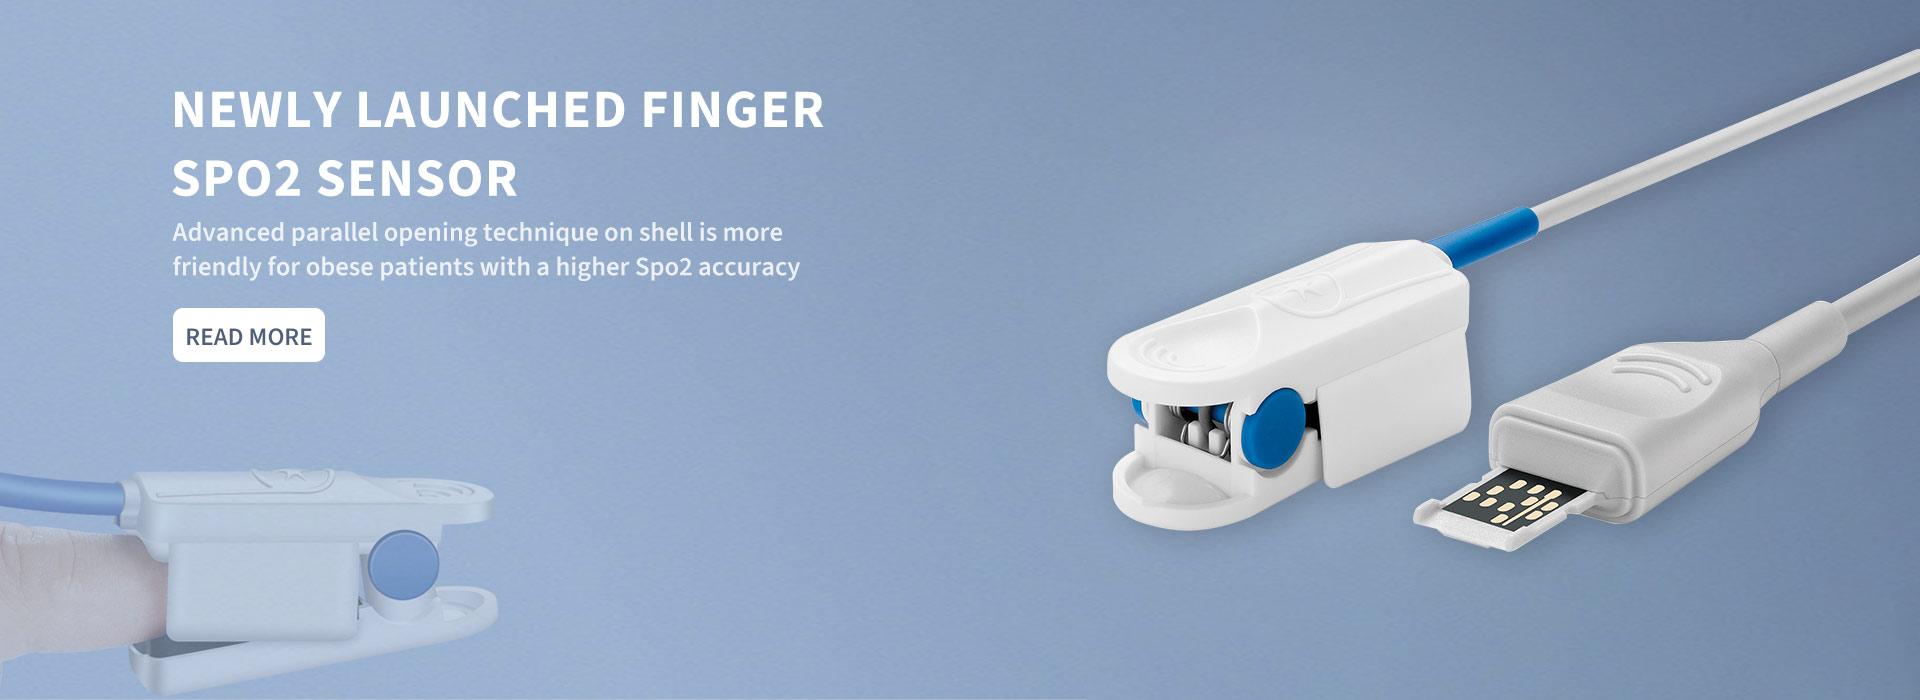 reusable spo2 sensor